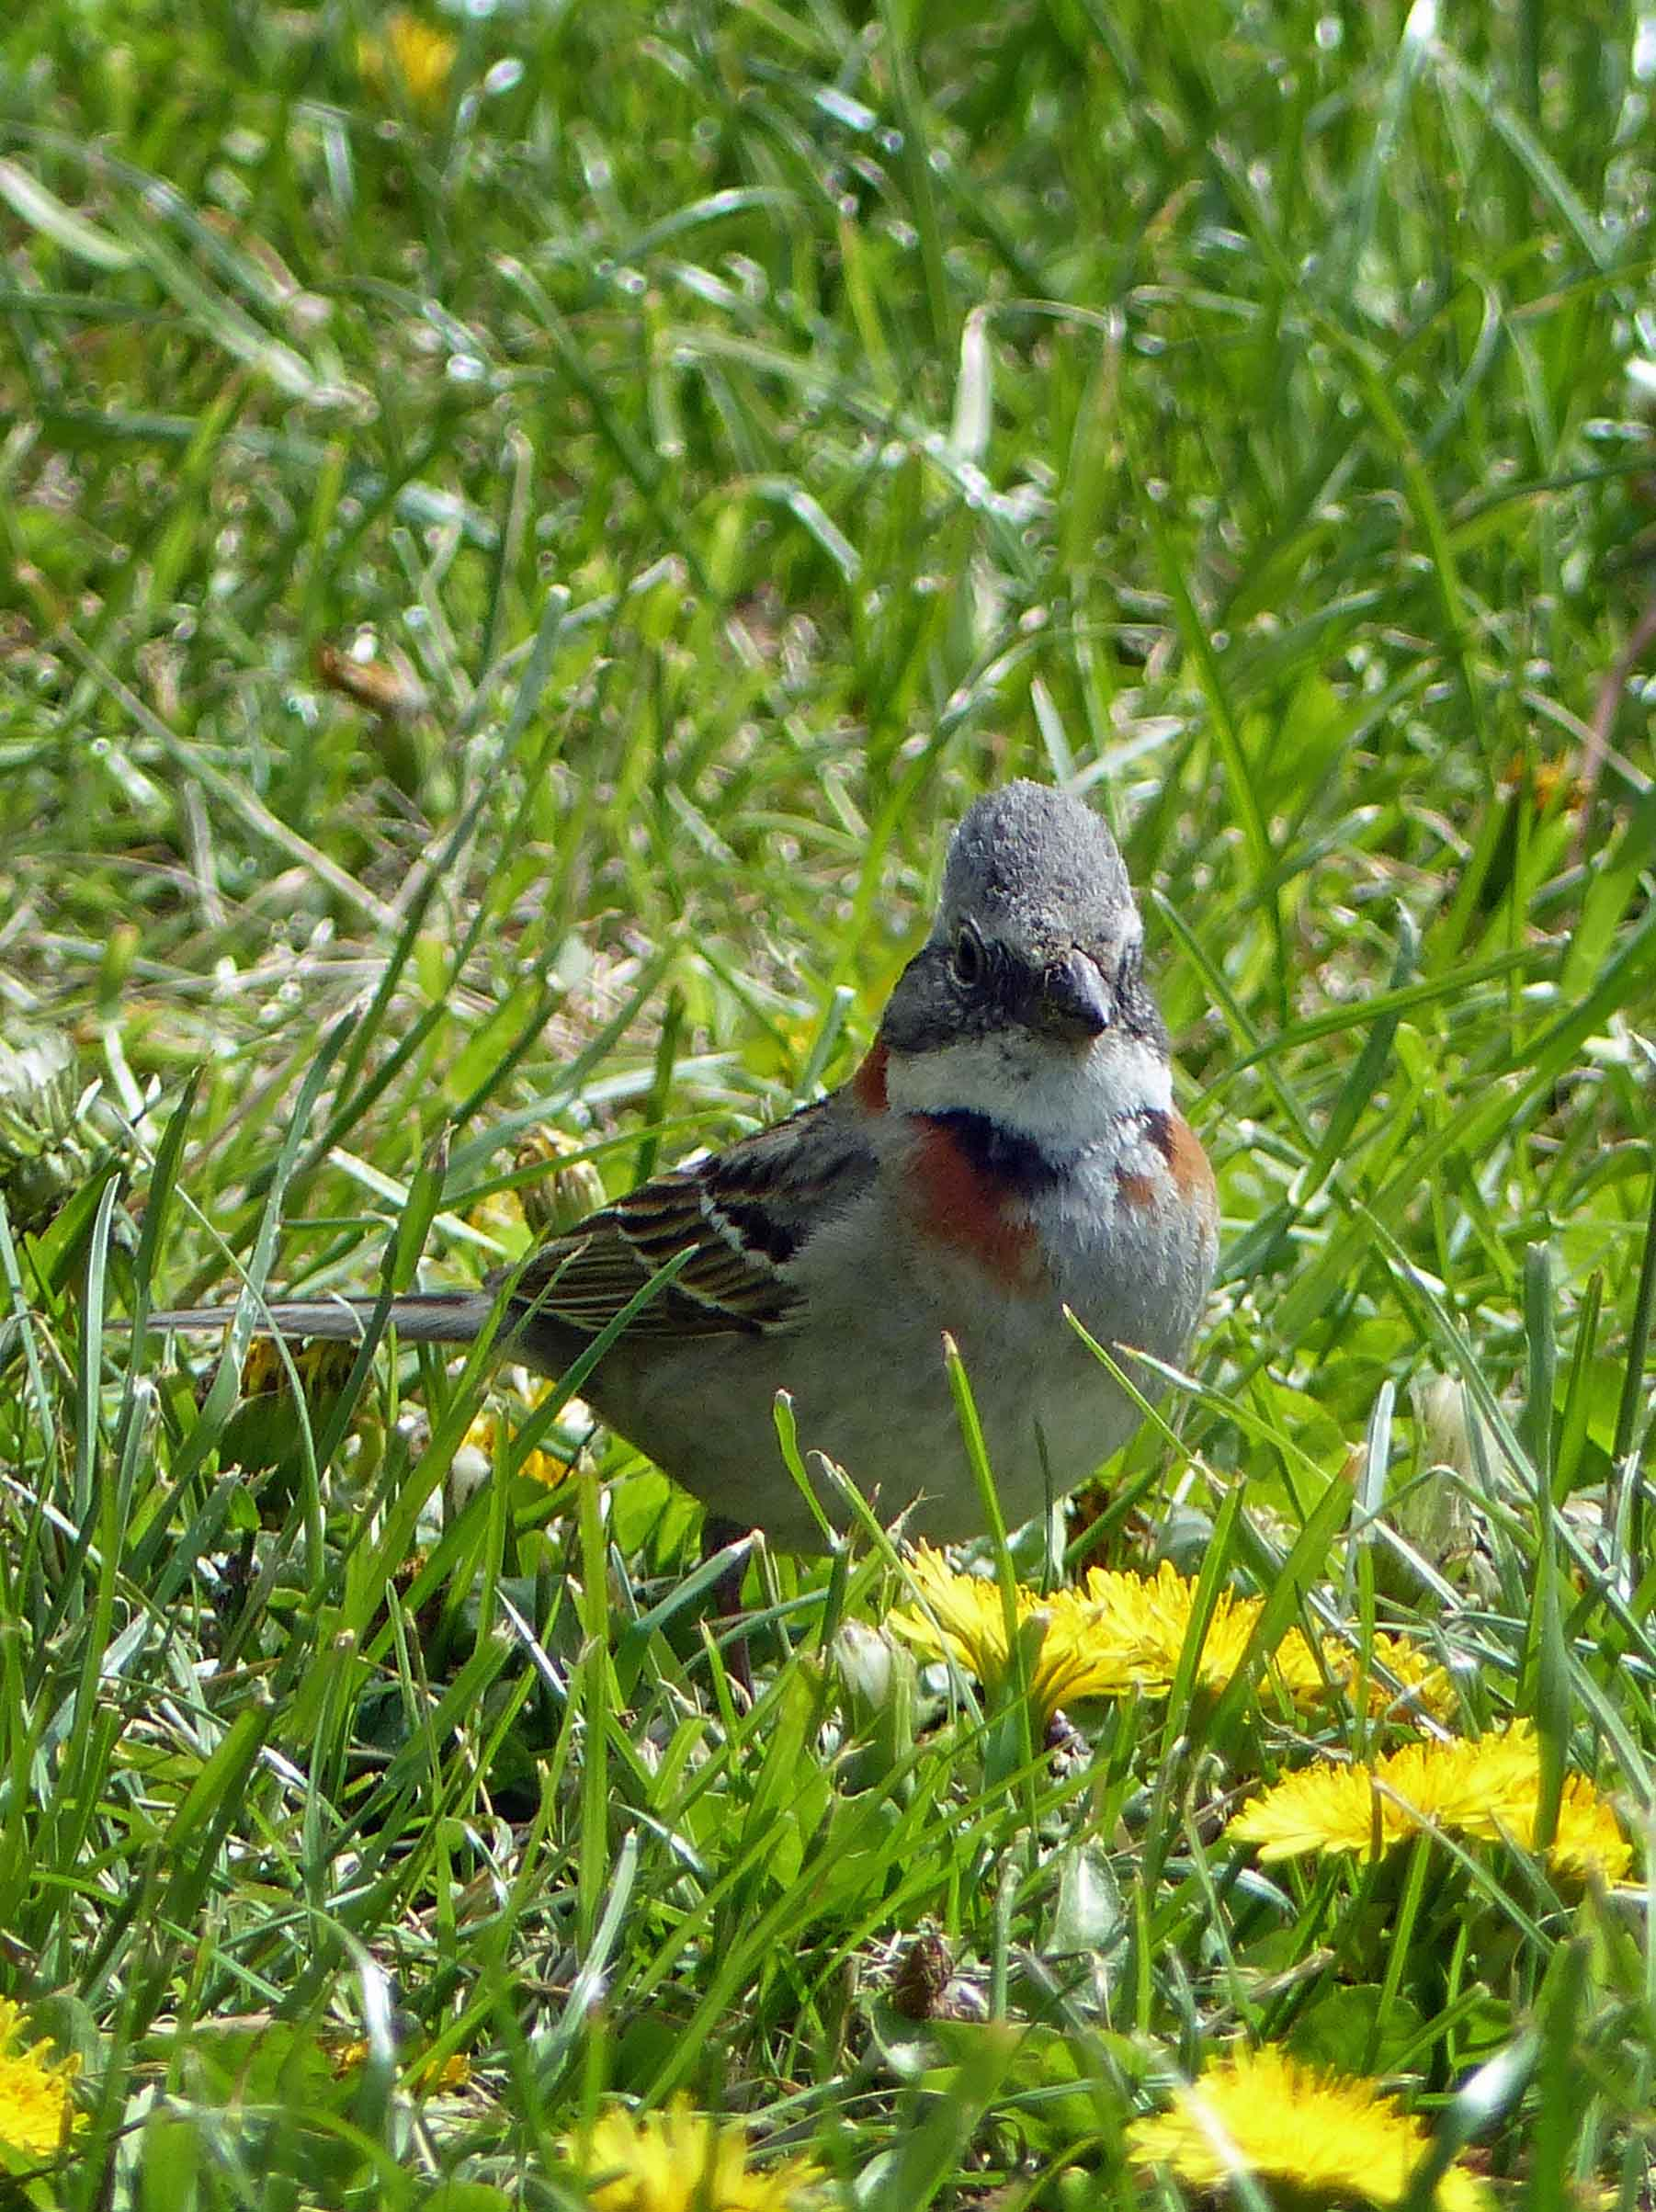 Brown bird in the grass